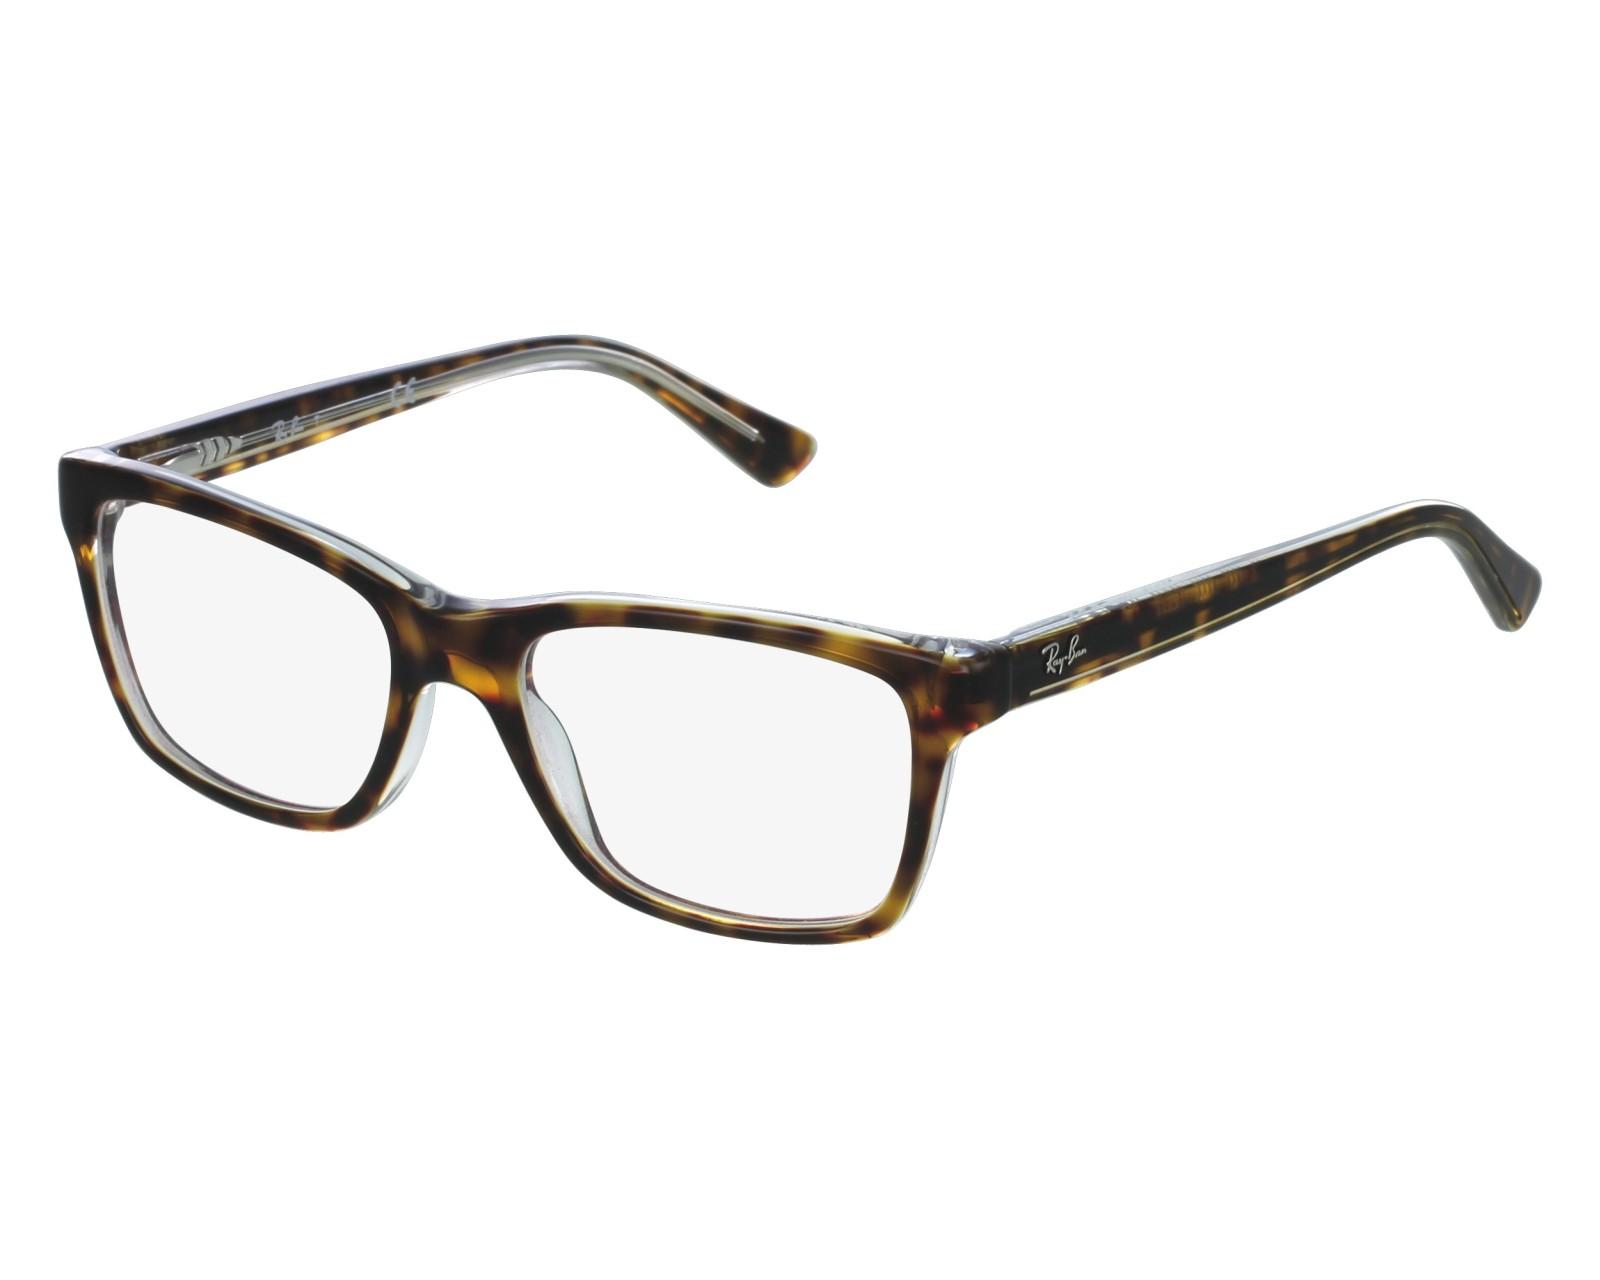 ray ban sonnenbrillen aktuelle kollektion